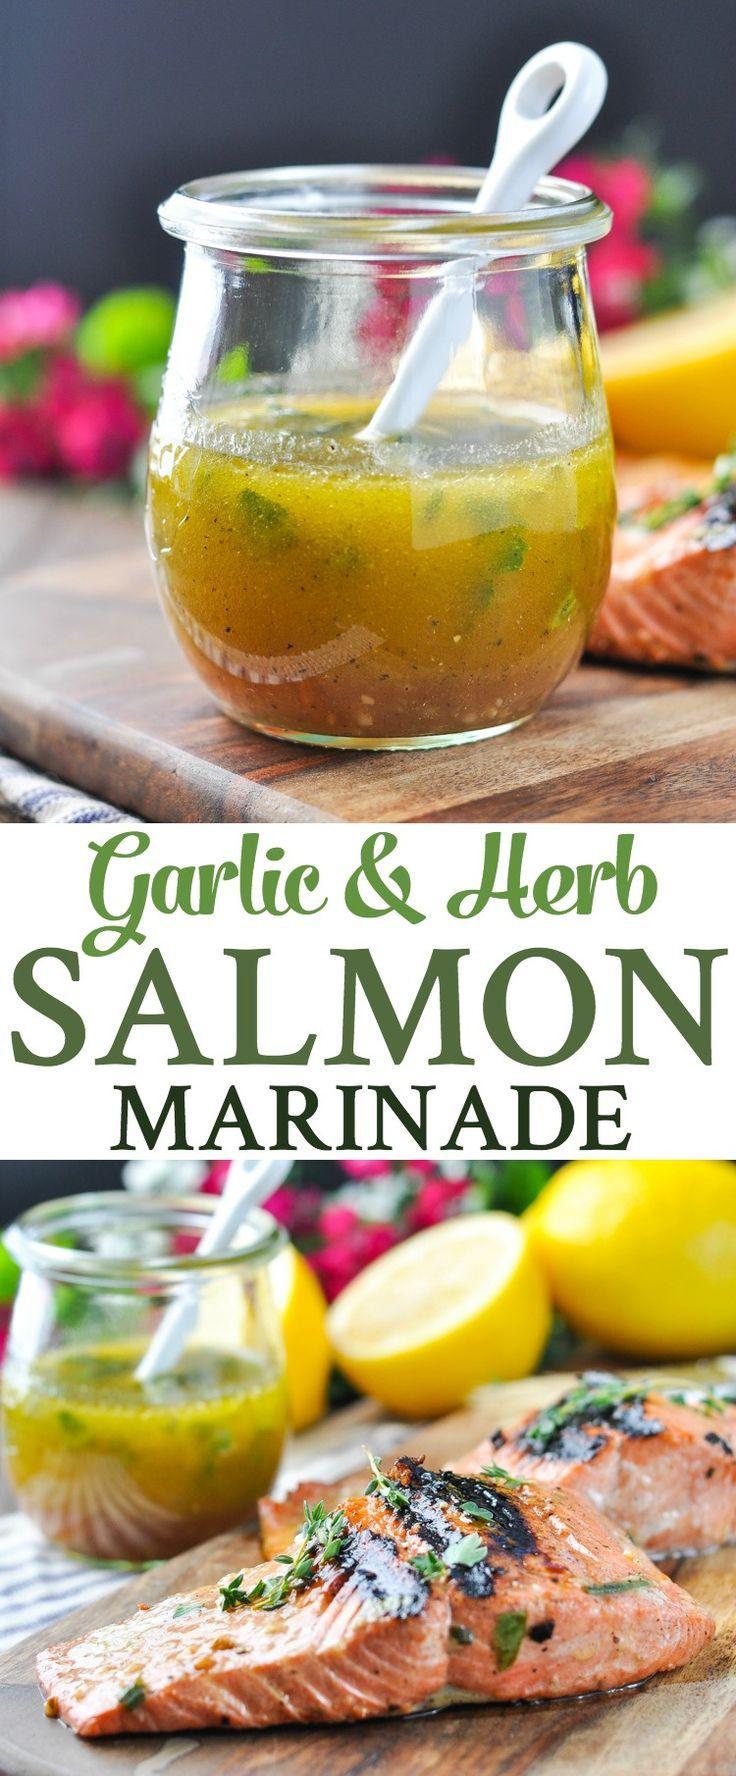 Garlic and Herb Salmon Marinade   Salmon Recipes Healthy   Fish Recipes   Dinner Ideas   Healthy Dinner Recipes   Seafood Recipes   Grilling Recipes   Marinade Recipes